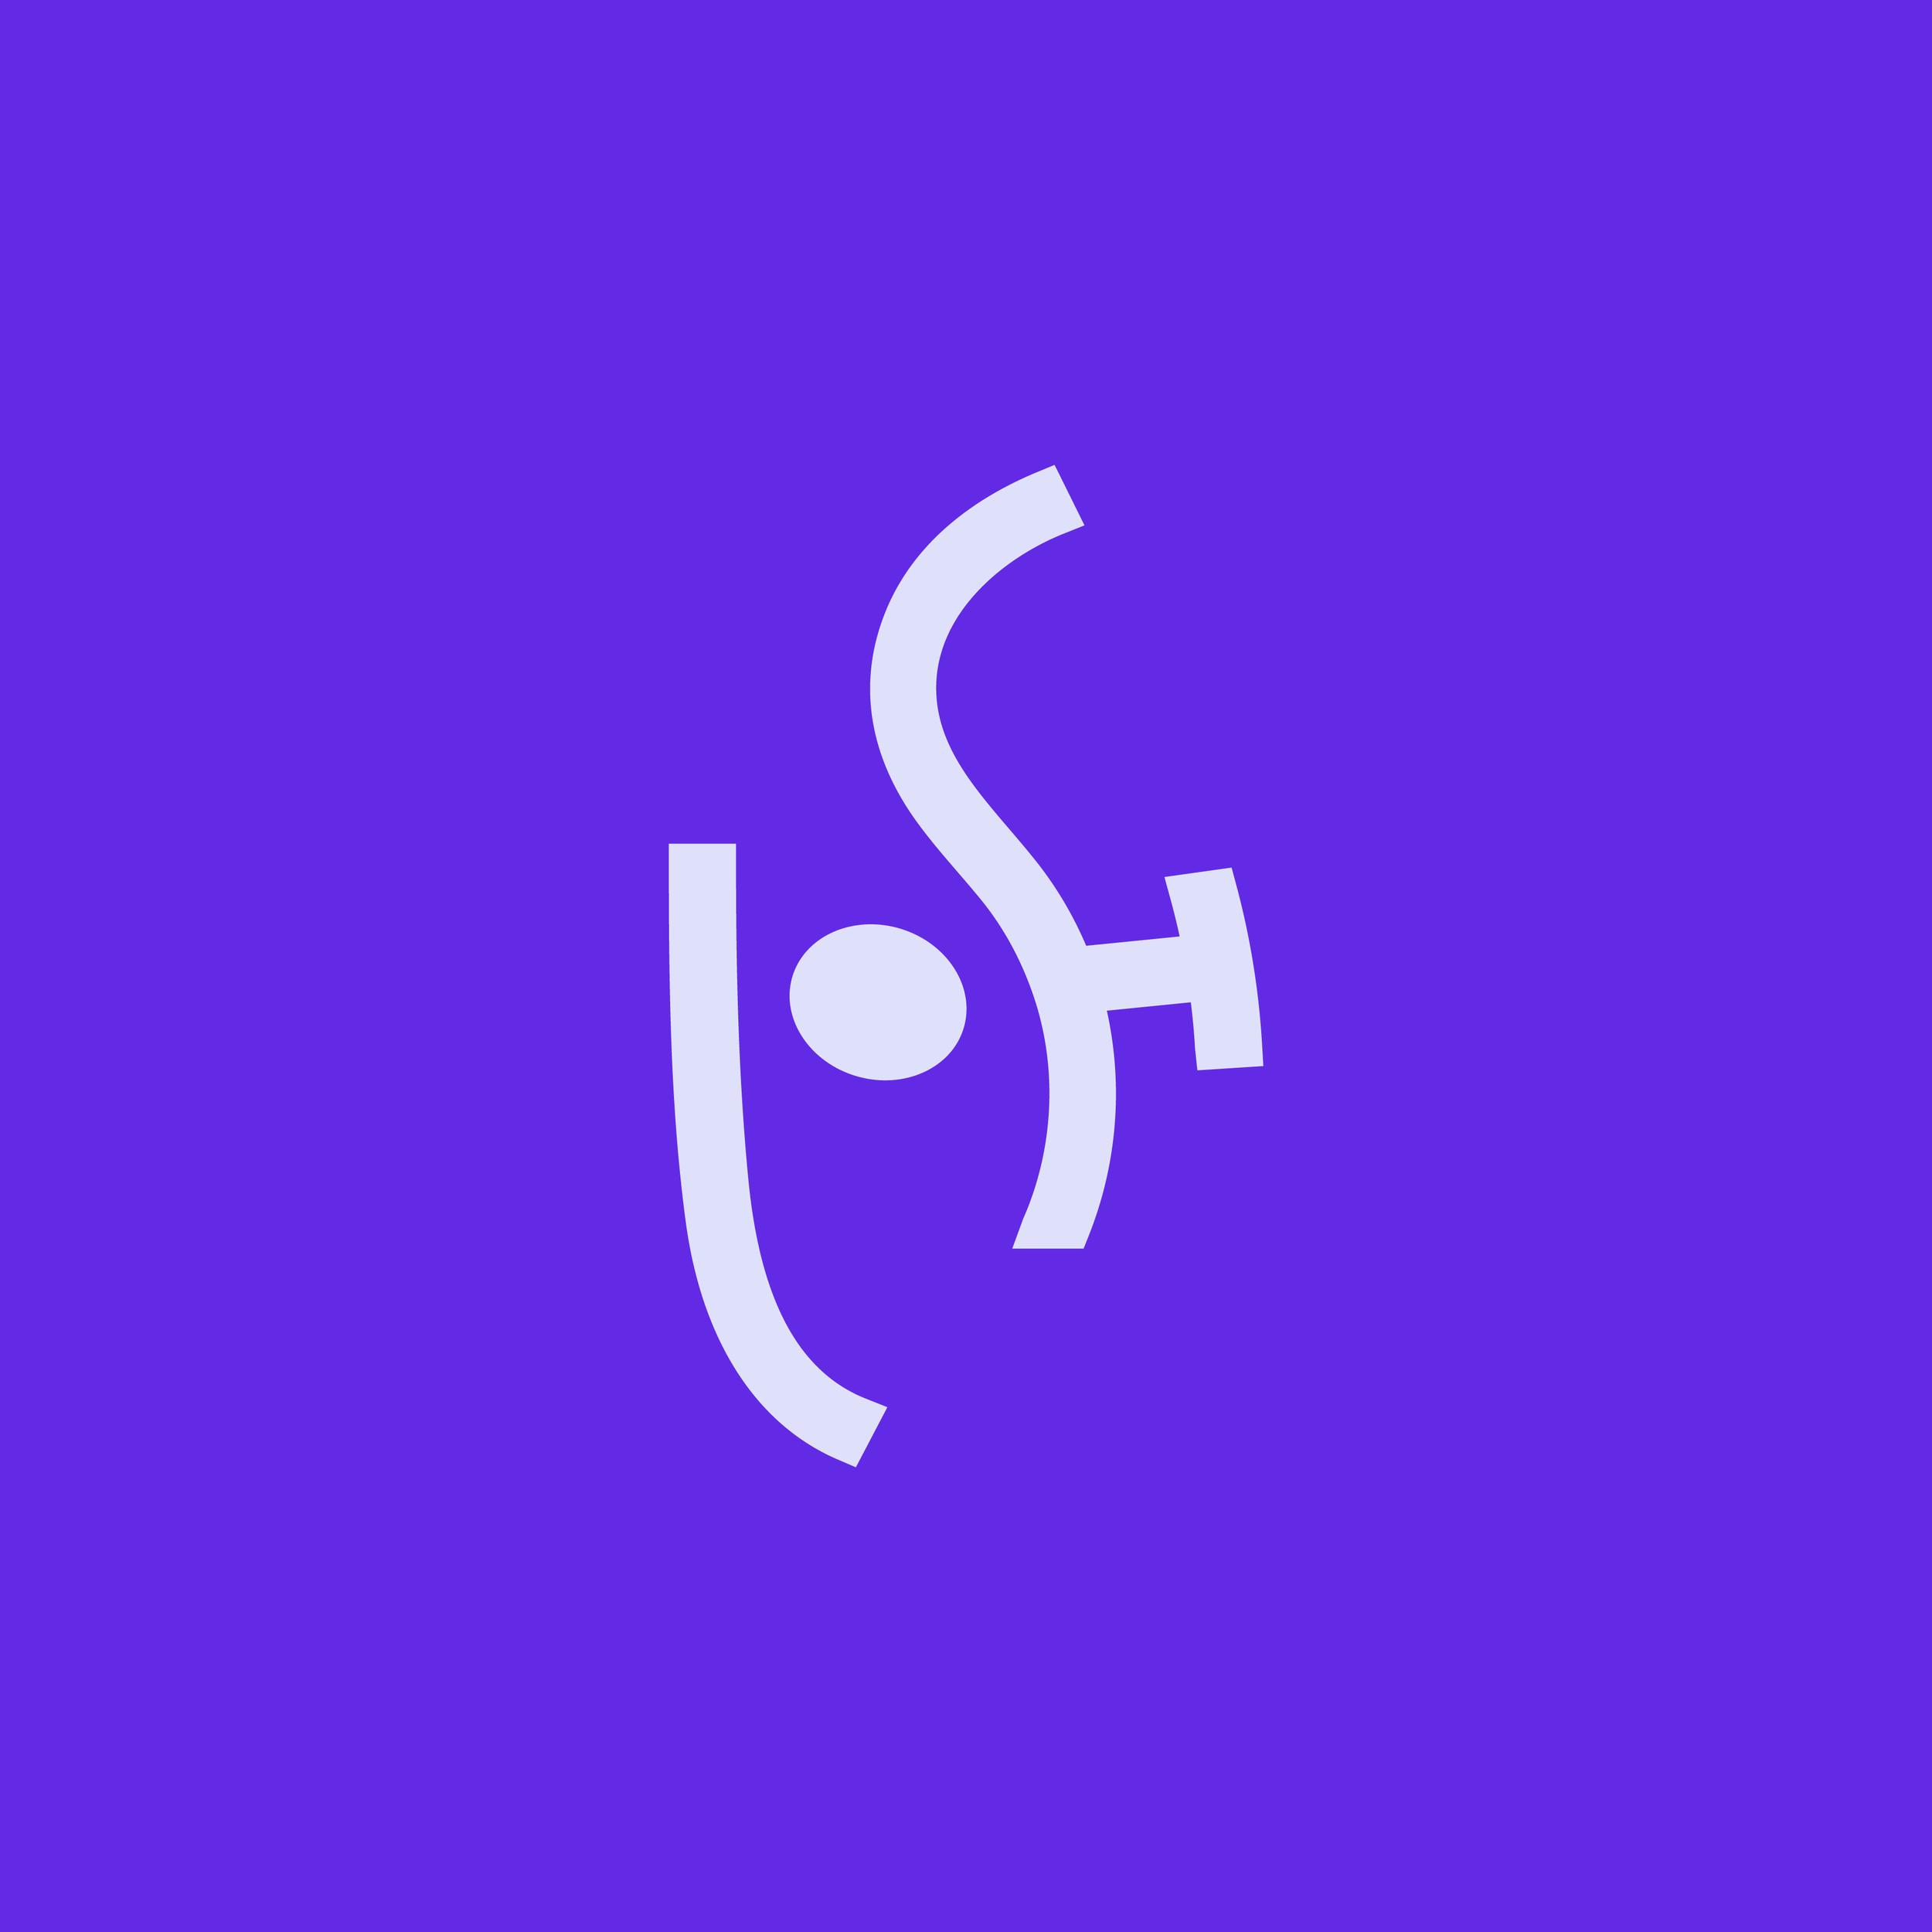 LOSH_logo_square-02.png